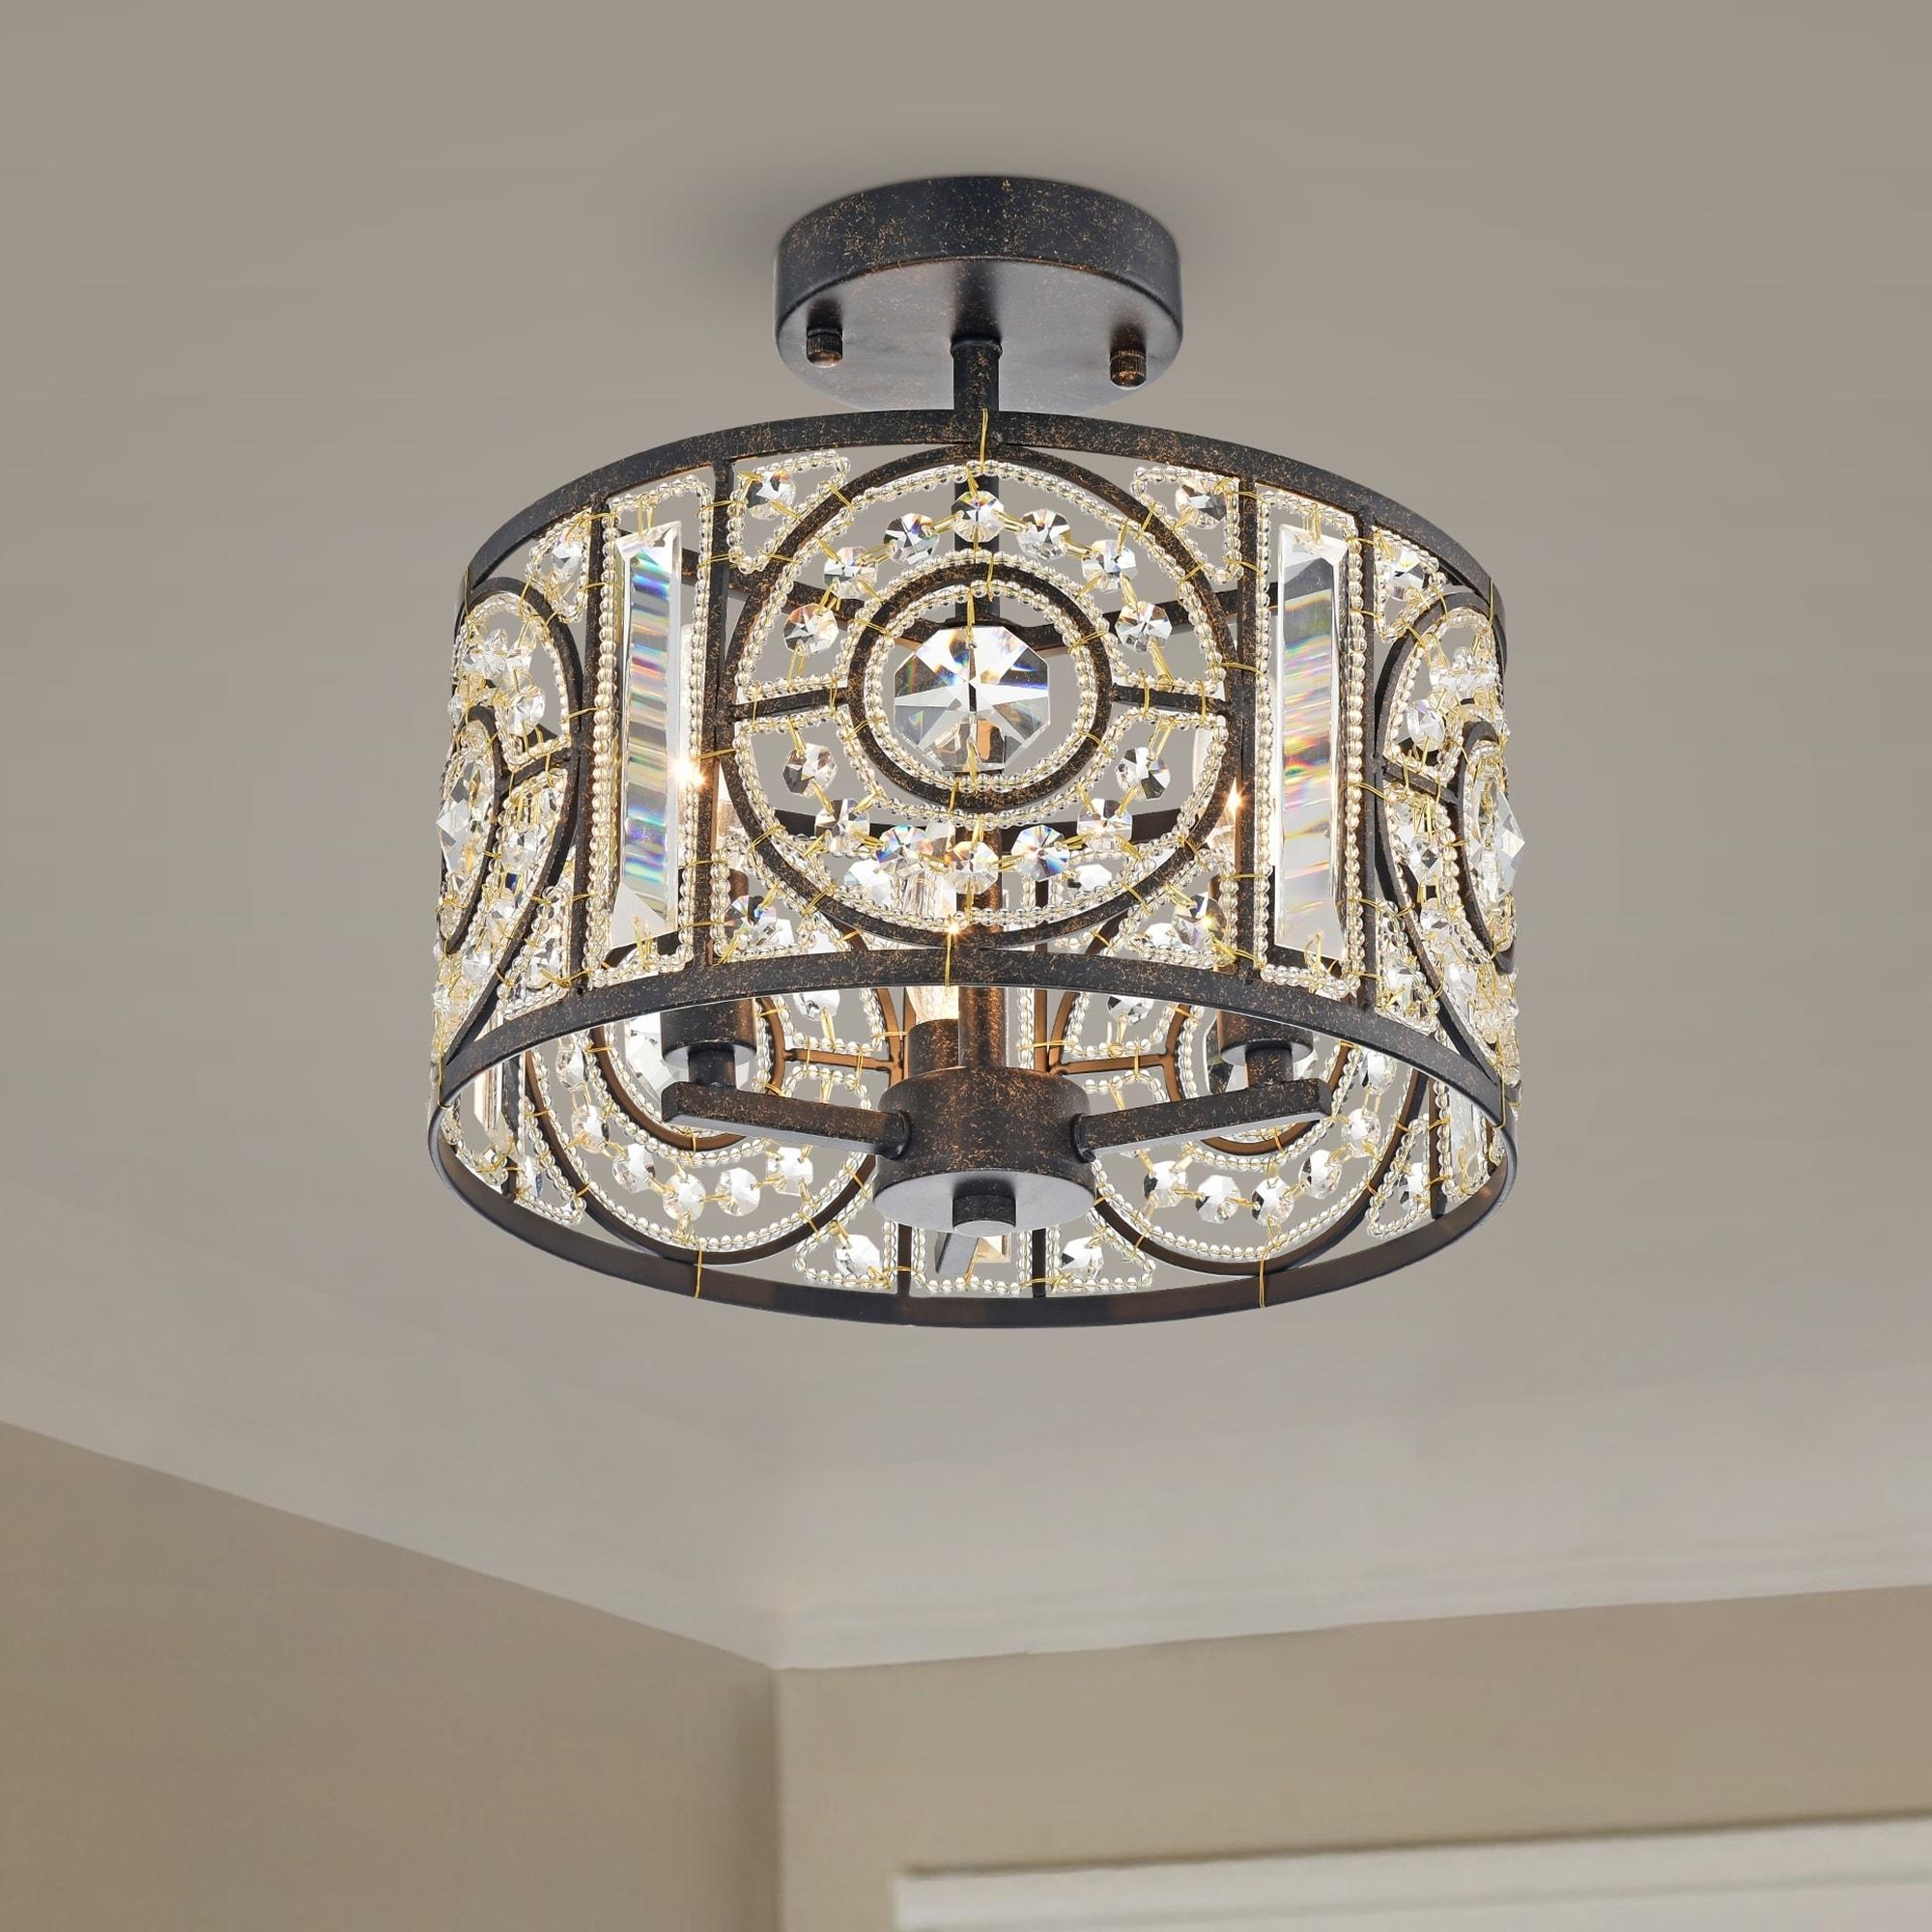 Crystal Chandelier Modern Mini Chandeliers 1-Light Bronze Light Fixtures Iron Flush Mount Ceiling Lights